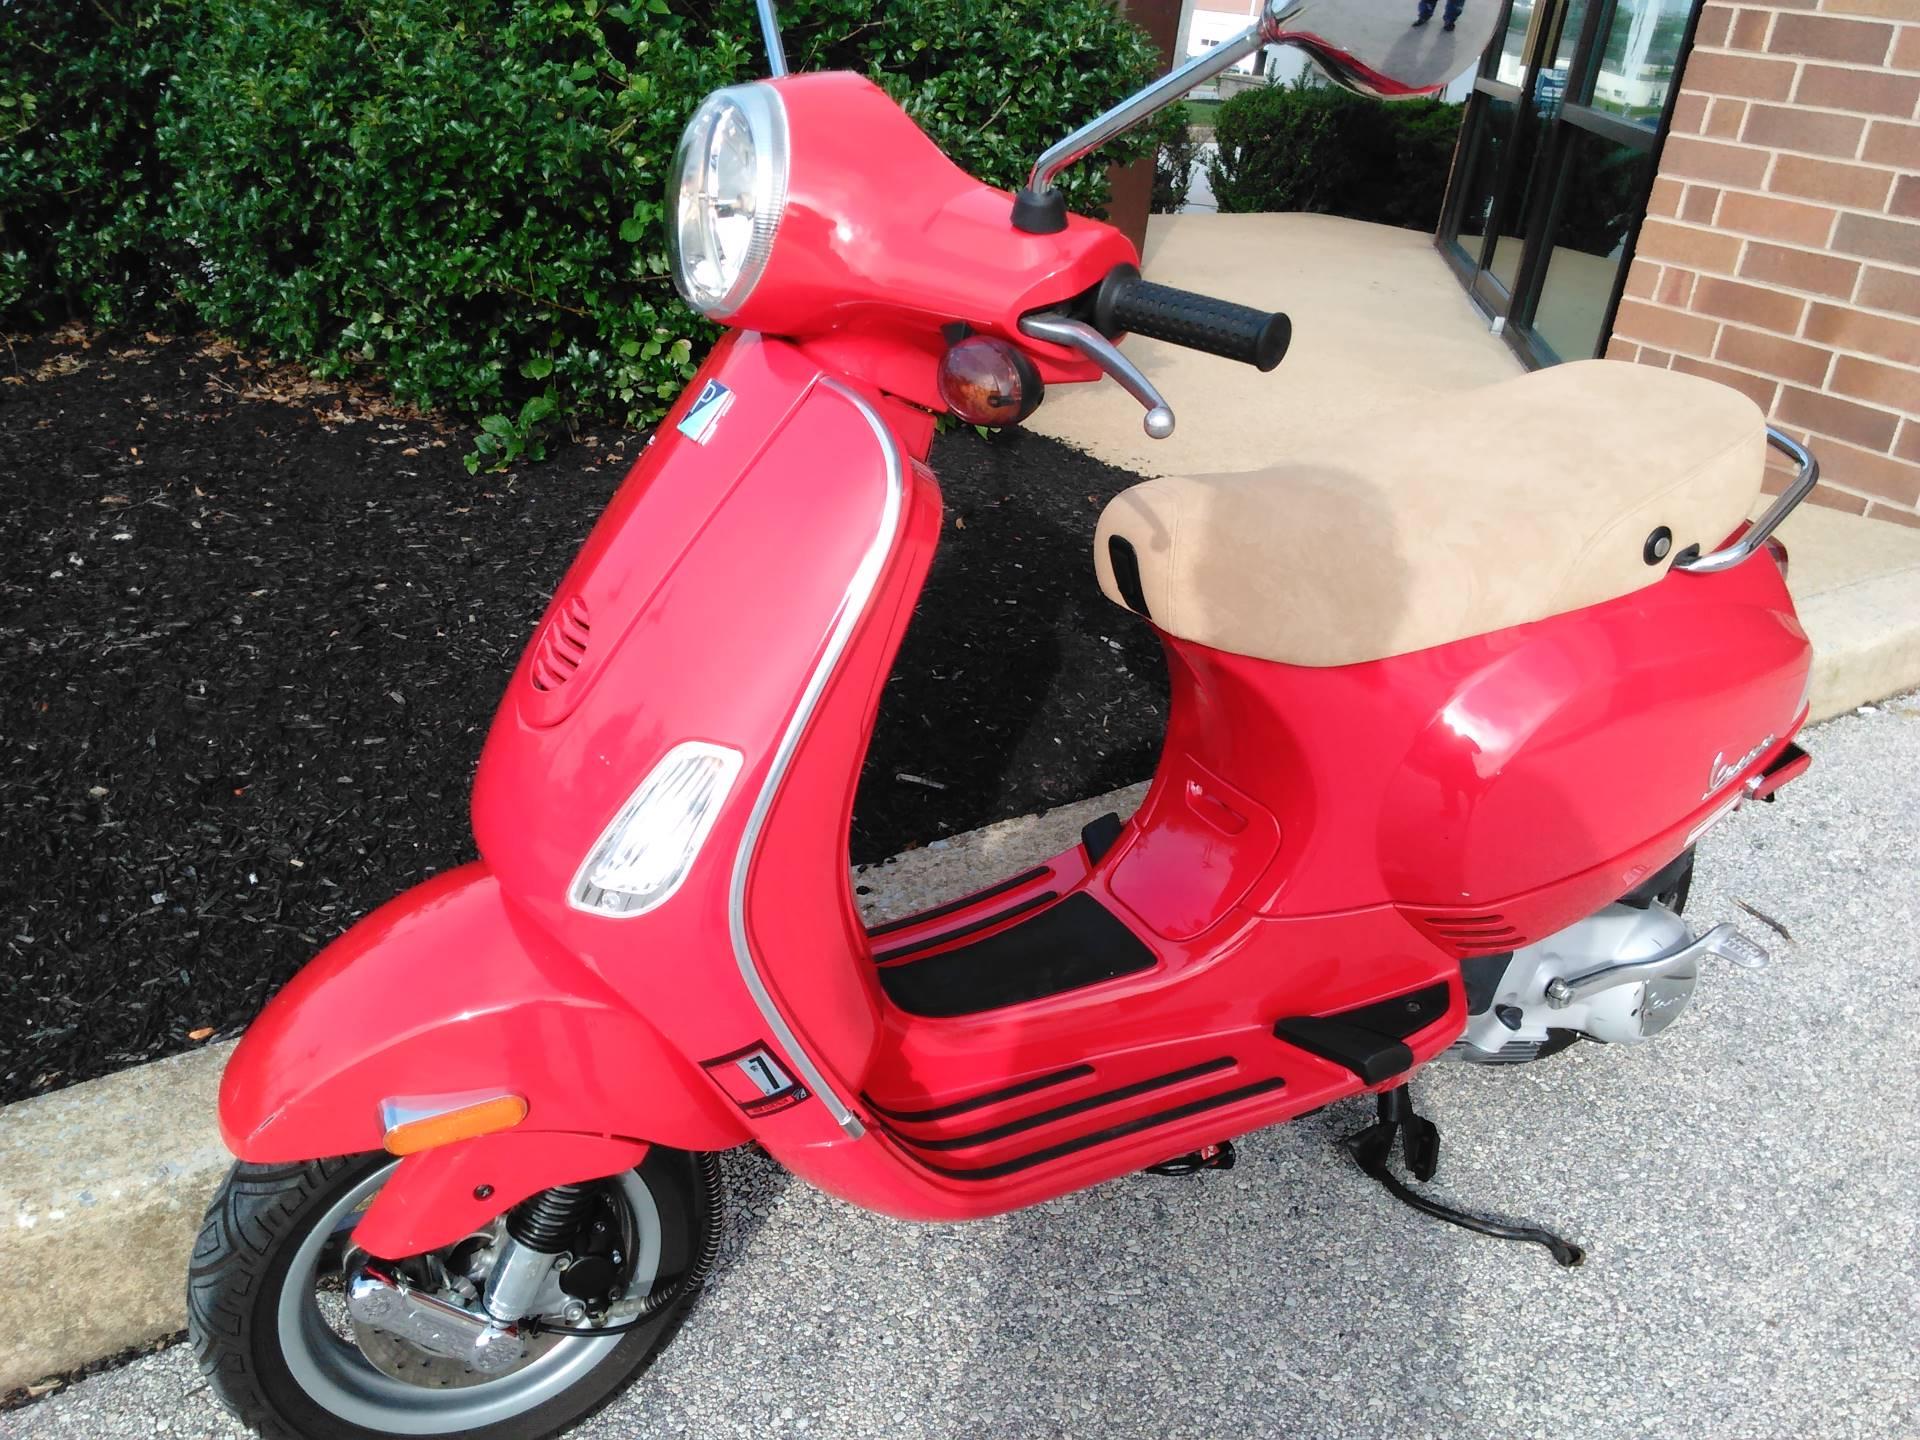 2006 Vespa LX 150 5